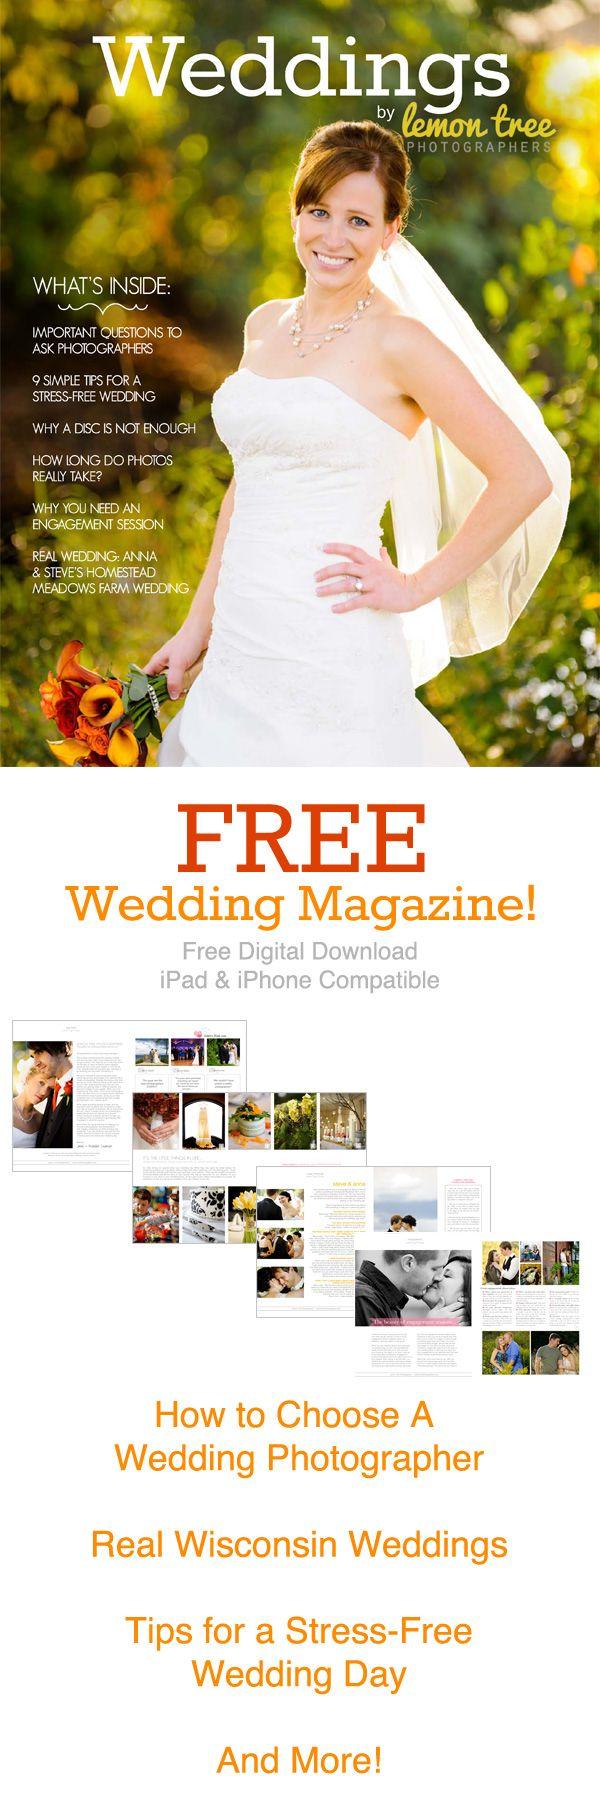 Free Wedding Magazine - Digital Download, iPad & iPhone Compatible